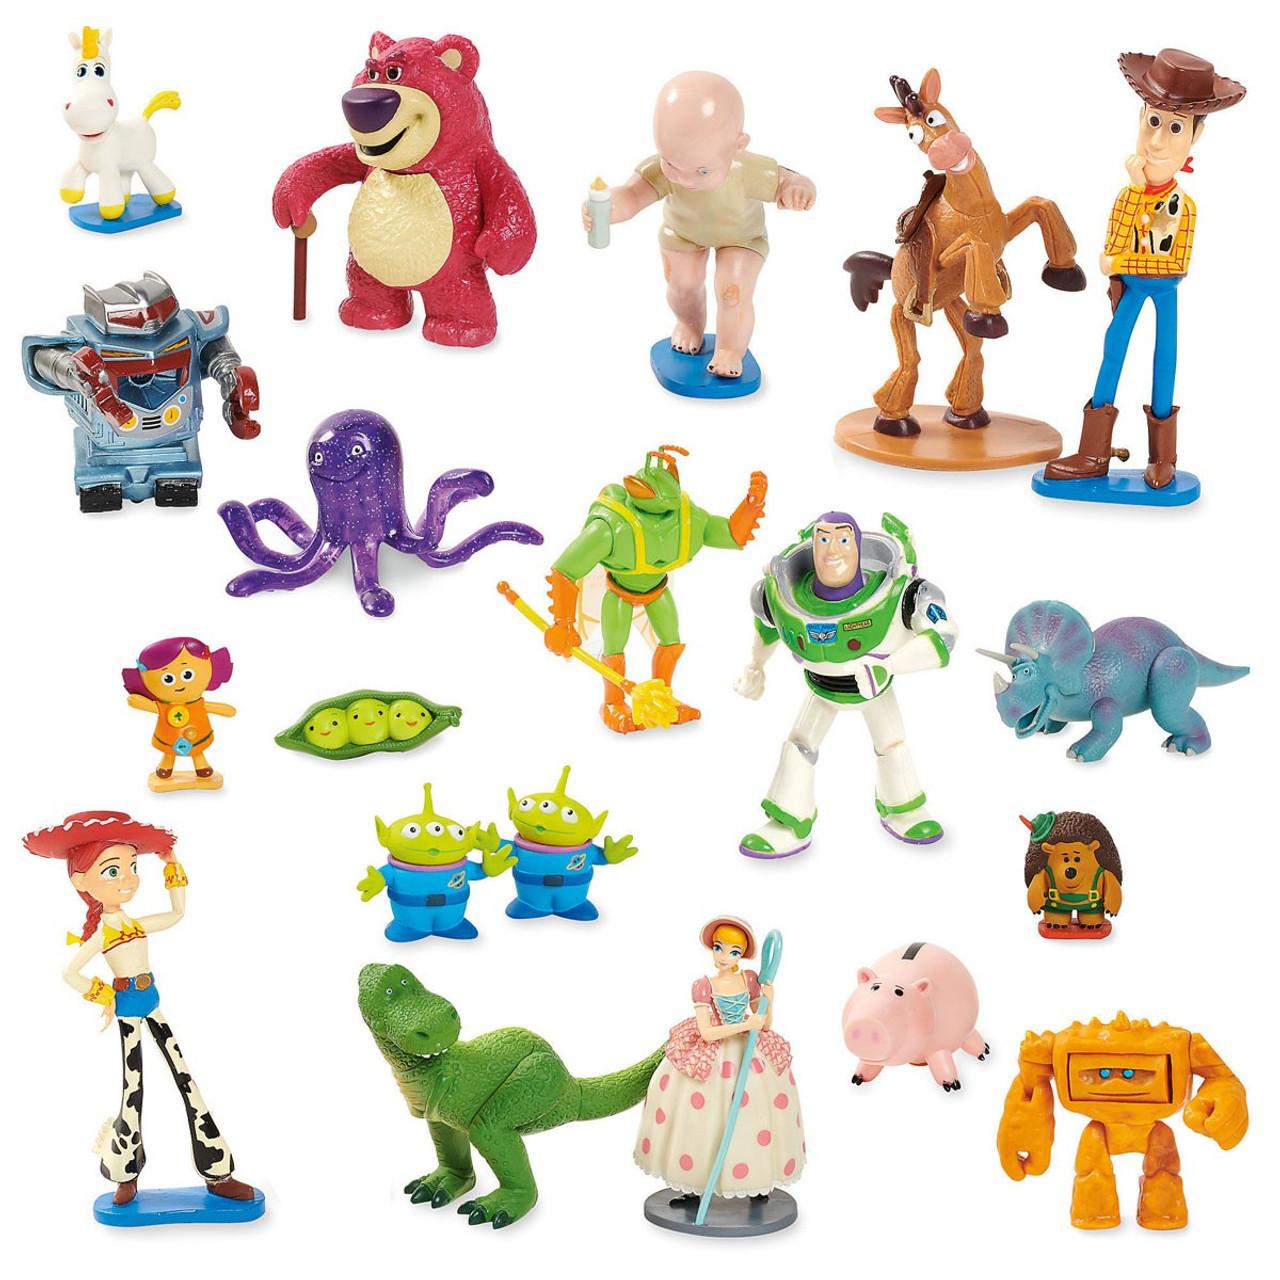 Disney Toy Story Toy Story Exclusive 20-Piece PVC Mega Figurine Playset -  ToyWiz 2bc7bd5f60a